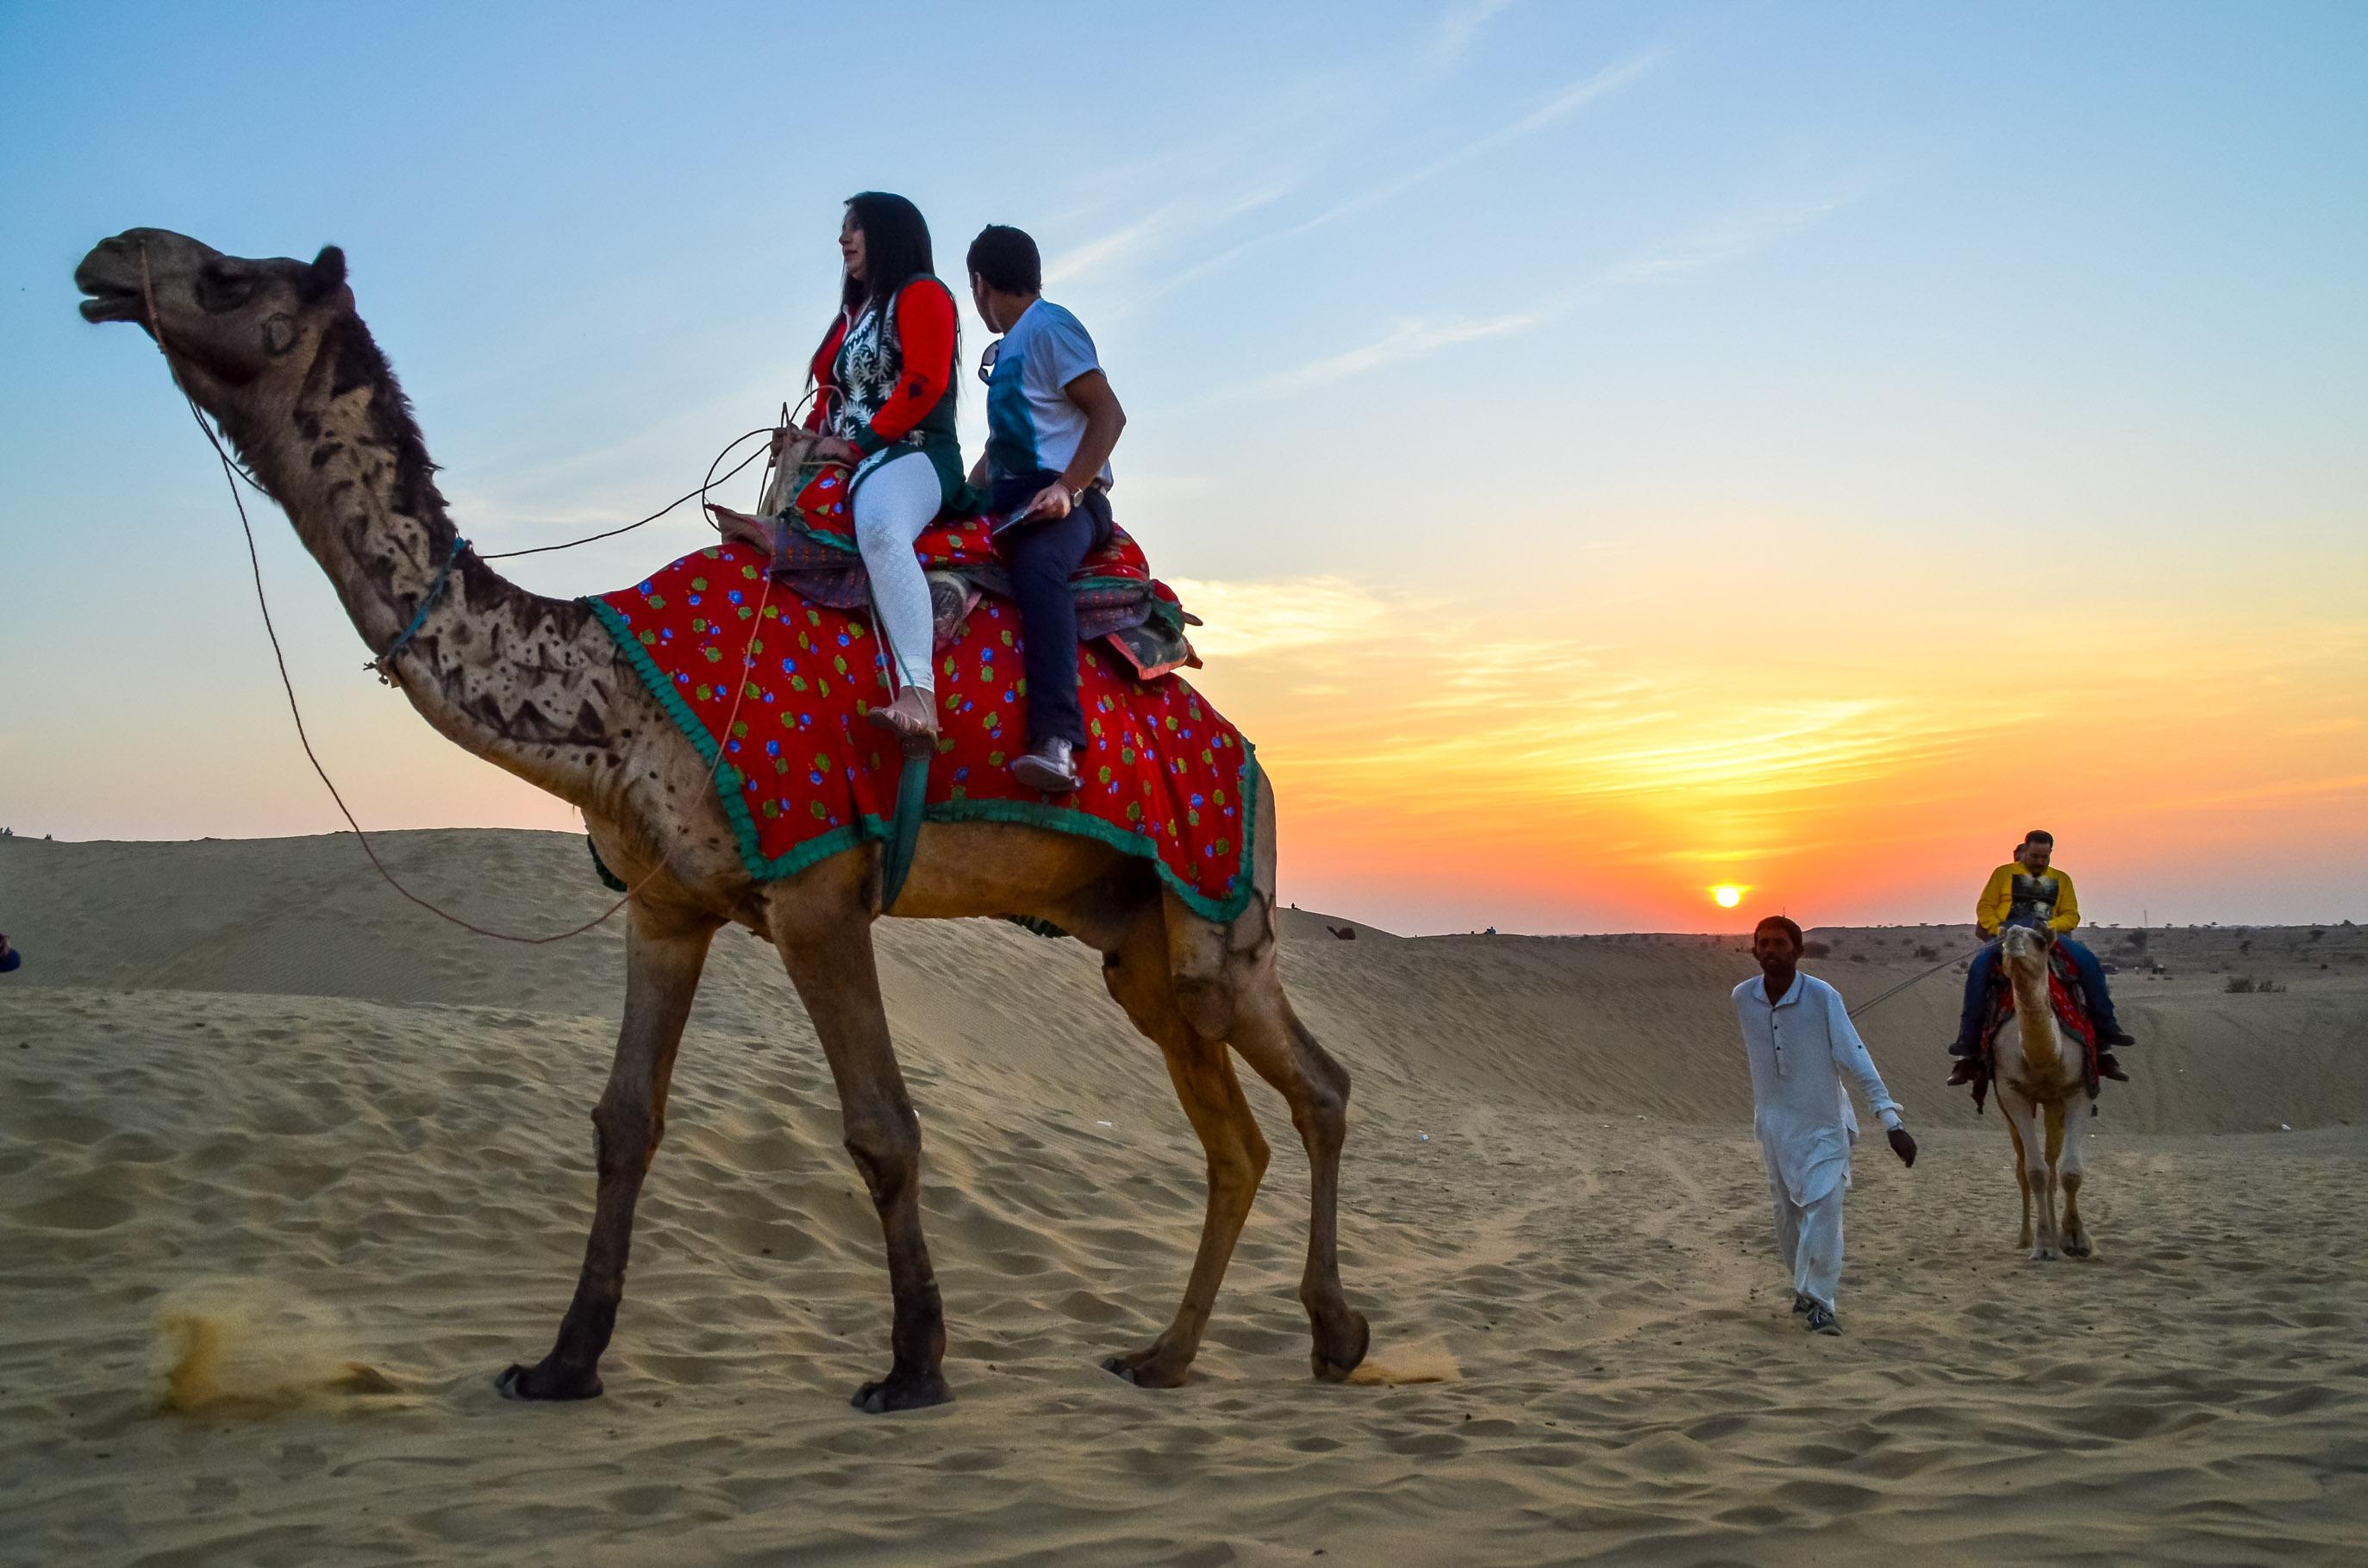 Camel Safari Desert Rajasthan